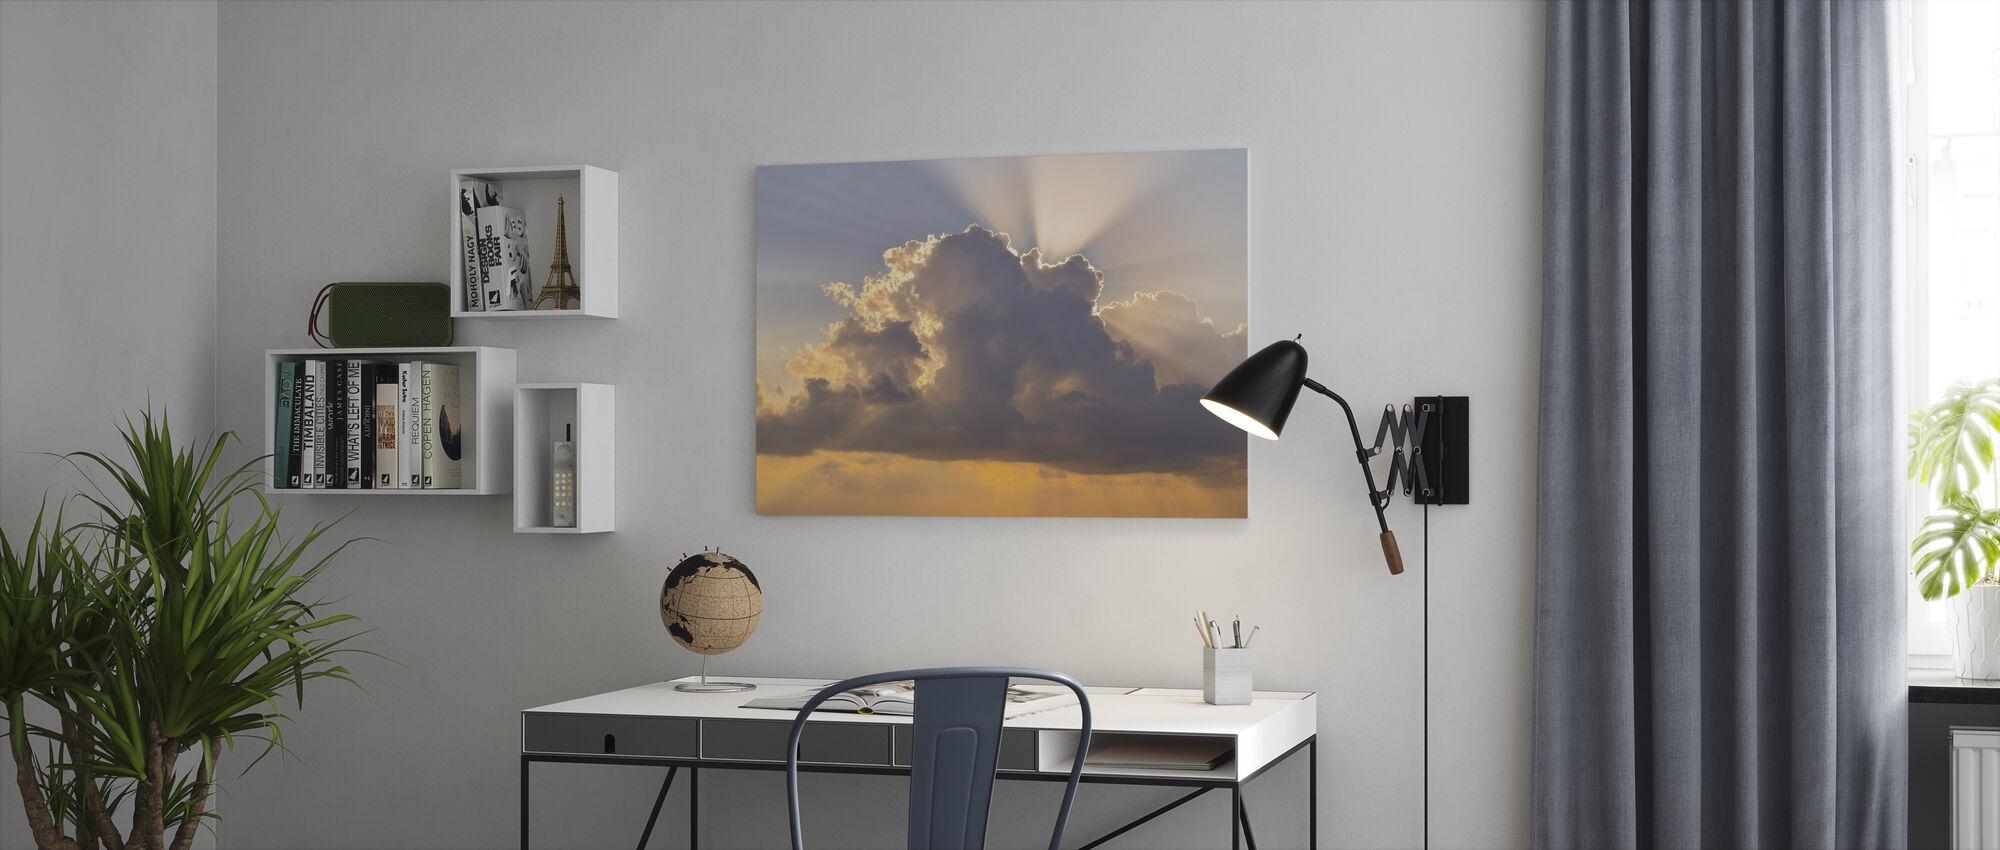 Cloudscape - Canvastaulu - Toimisto